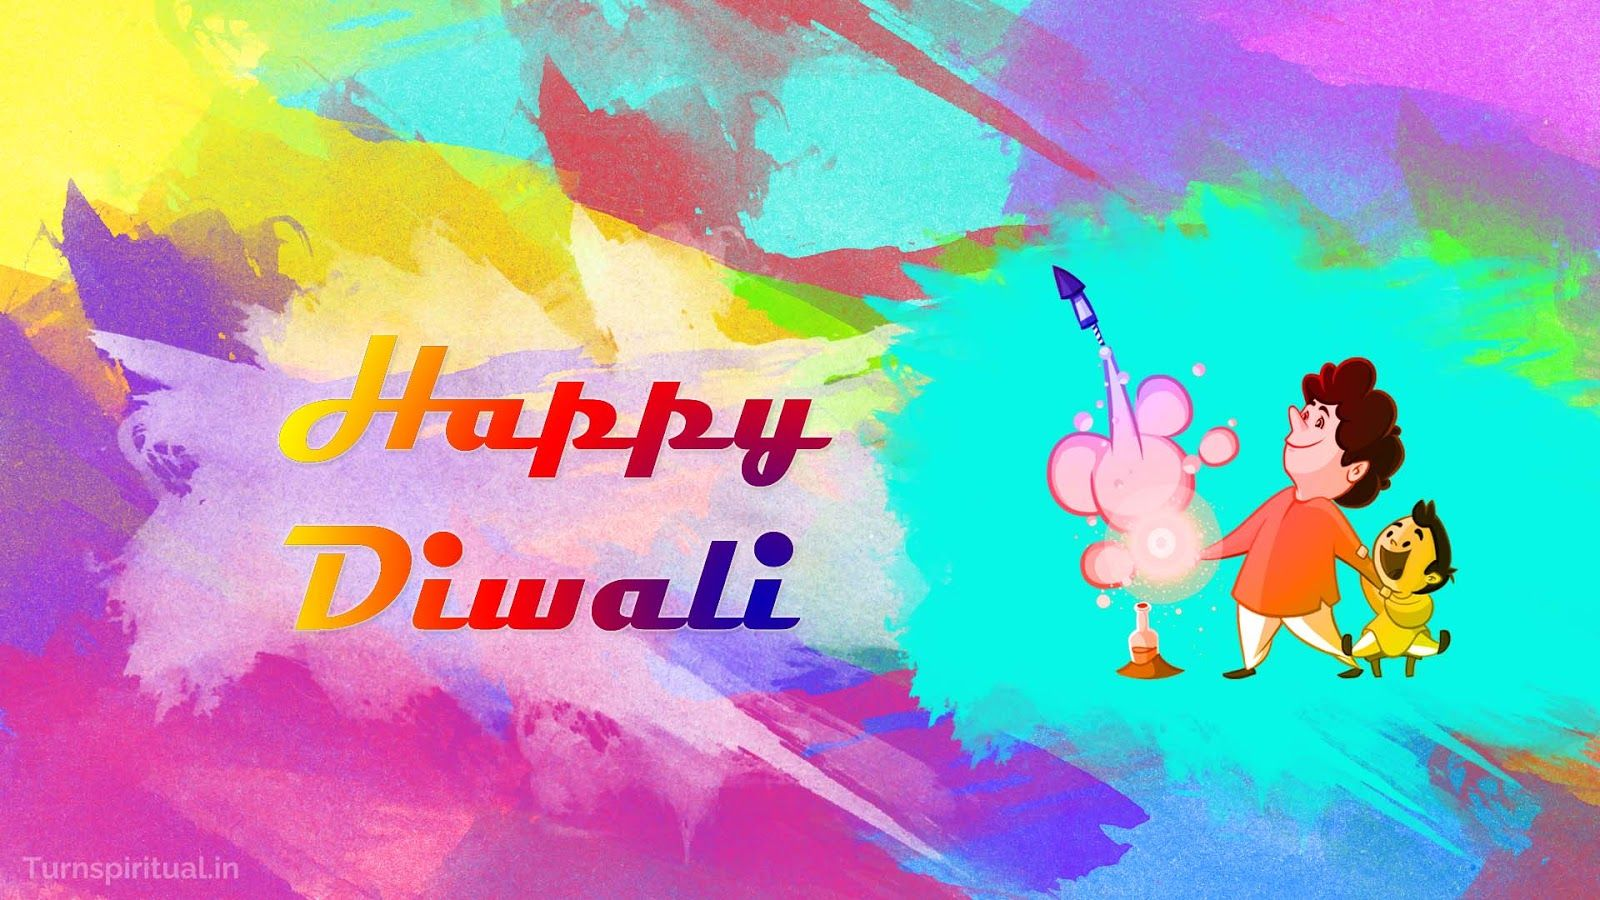 Happy Diwali Deepavali 2015 Diwali Wishes Greeting Cards